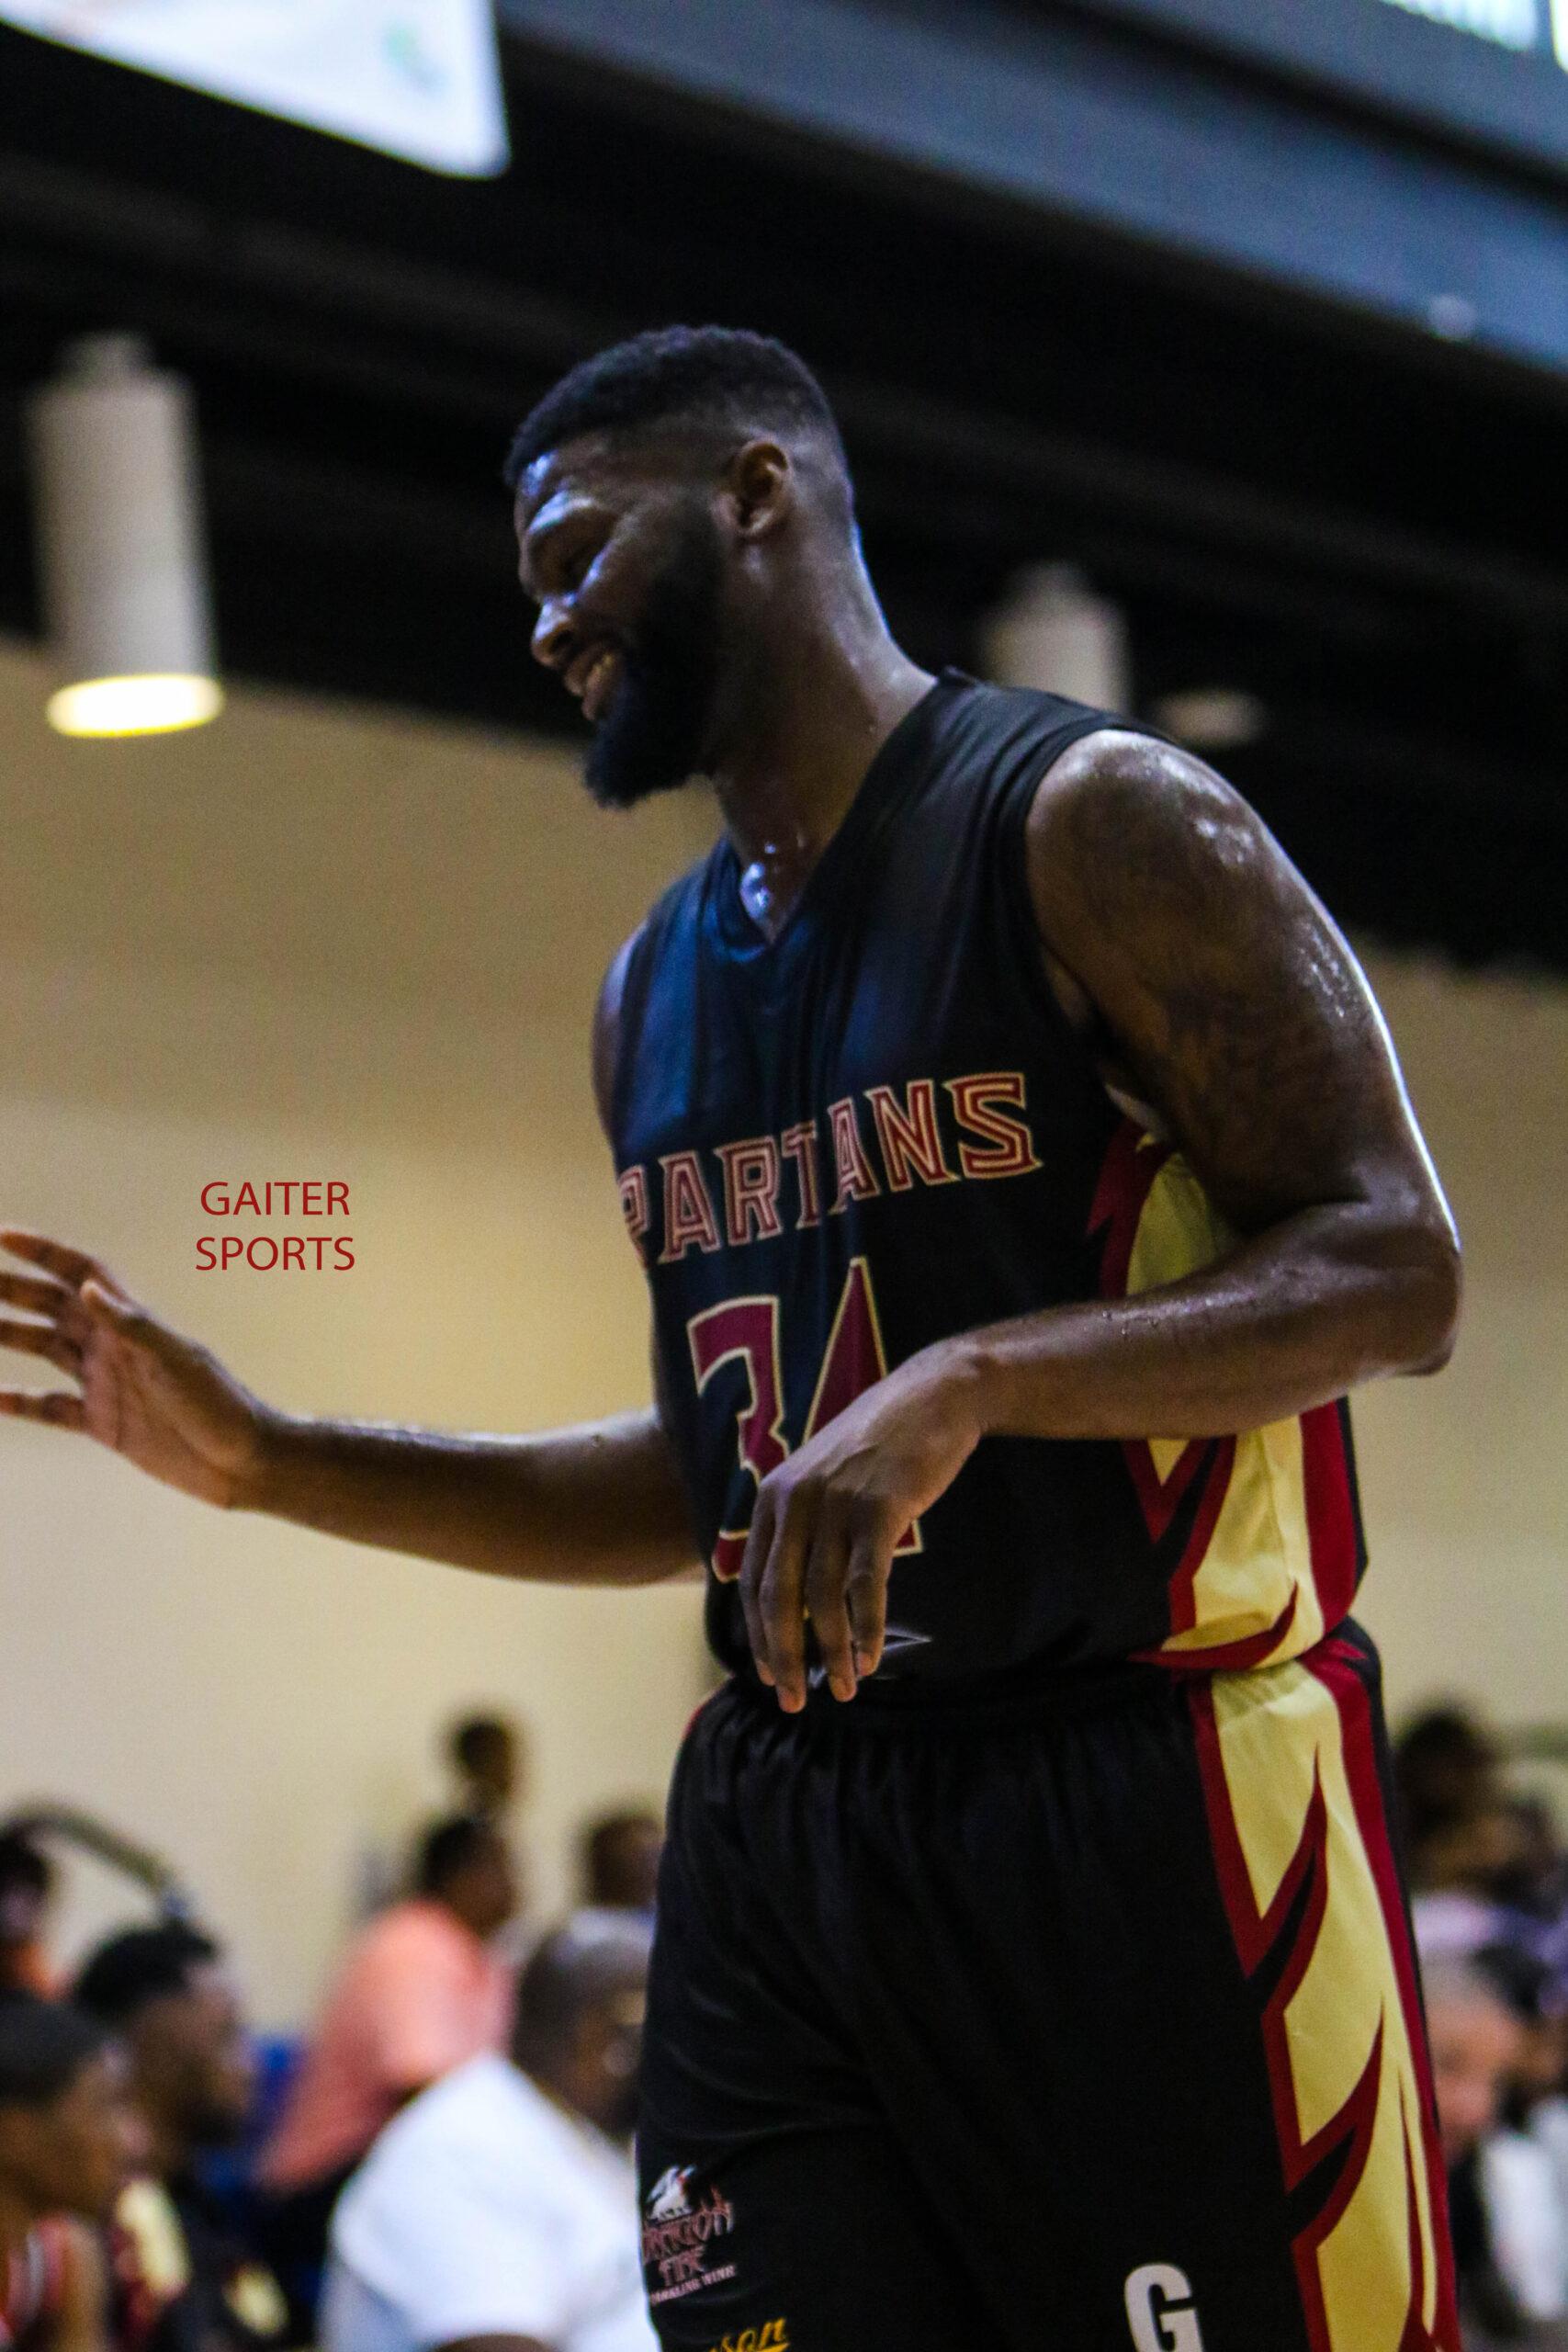 2019 Celebrity Basketball Game Georgia Spartans 98